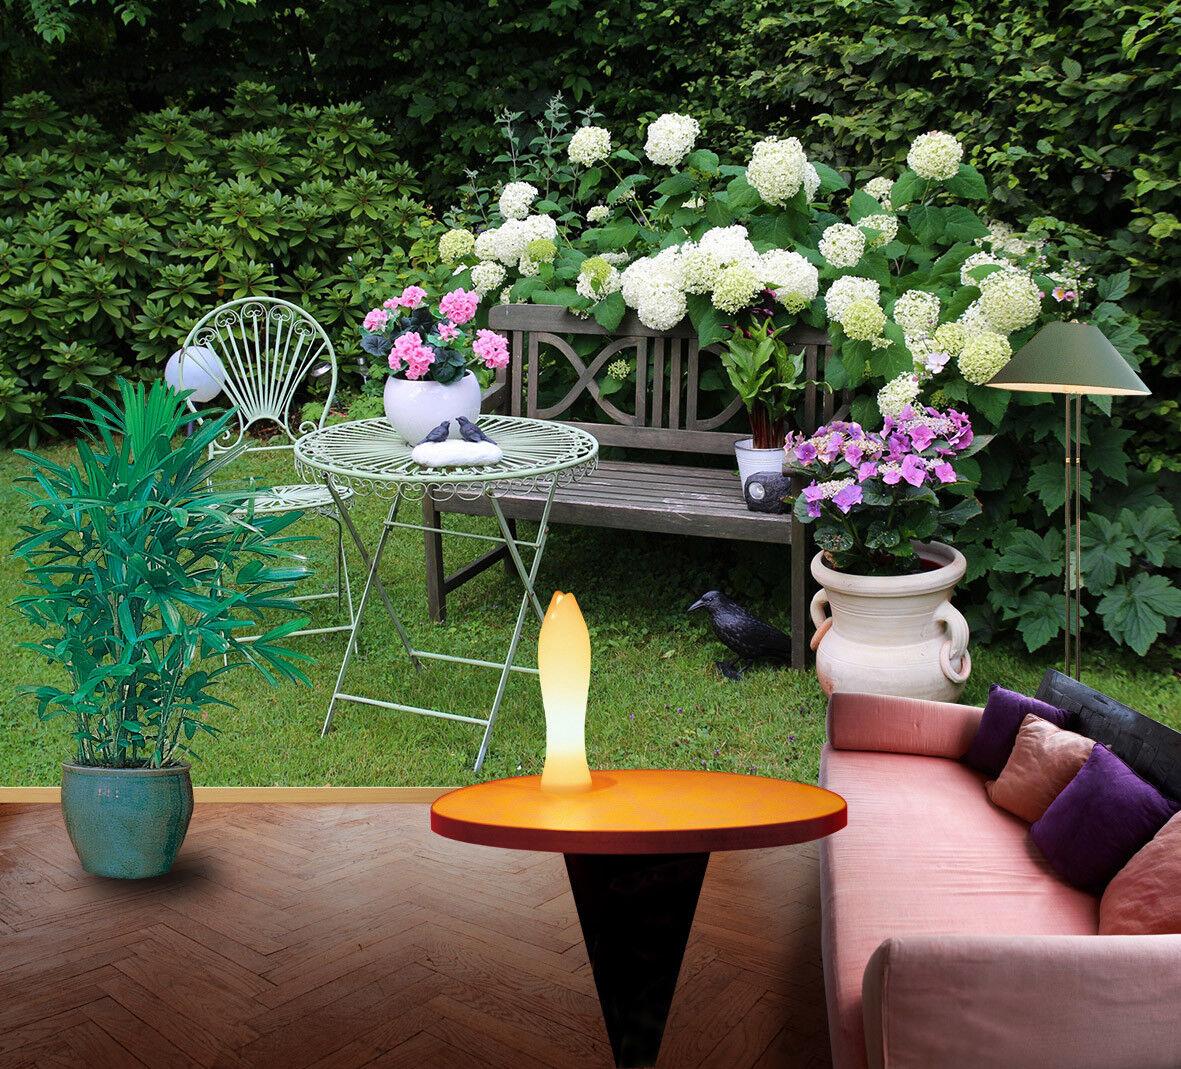 3D Garten Gras Blaumen 9588 Tapete Wandgemälde Tapeten Bild Familie DE Lemon    Düsseldorf Online Shop    Qualitativ Hochwertiges Produkt    Düsseldorf Online Shop